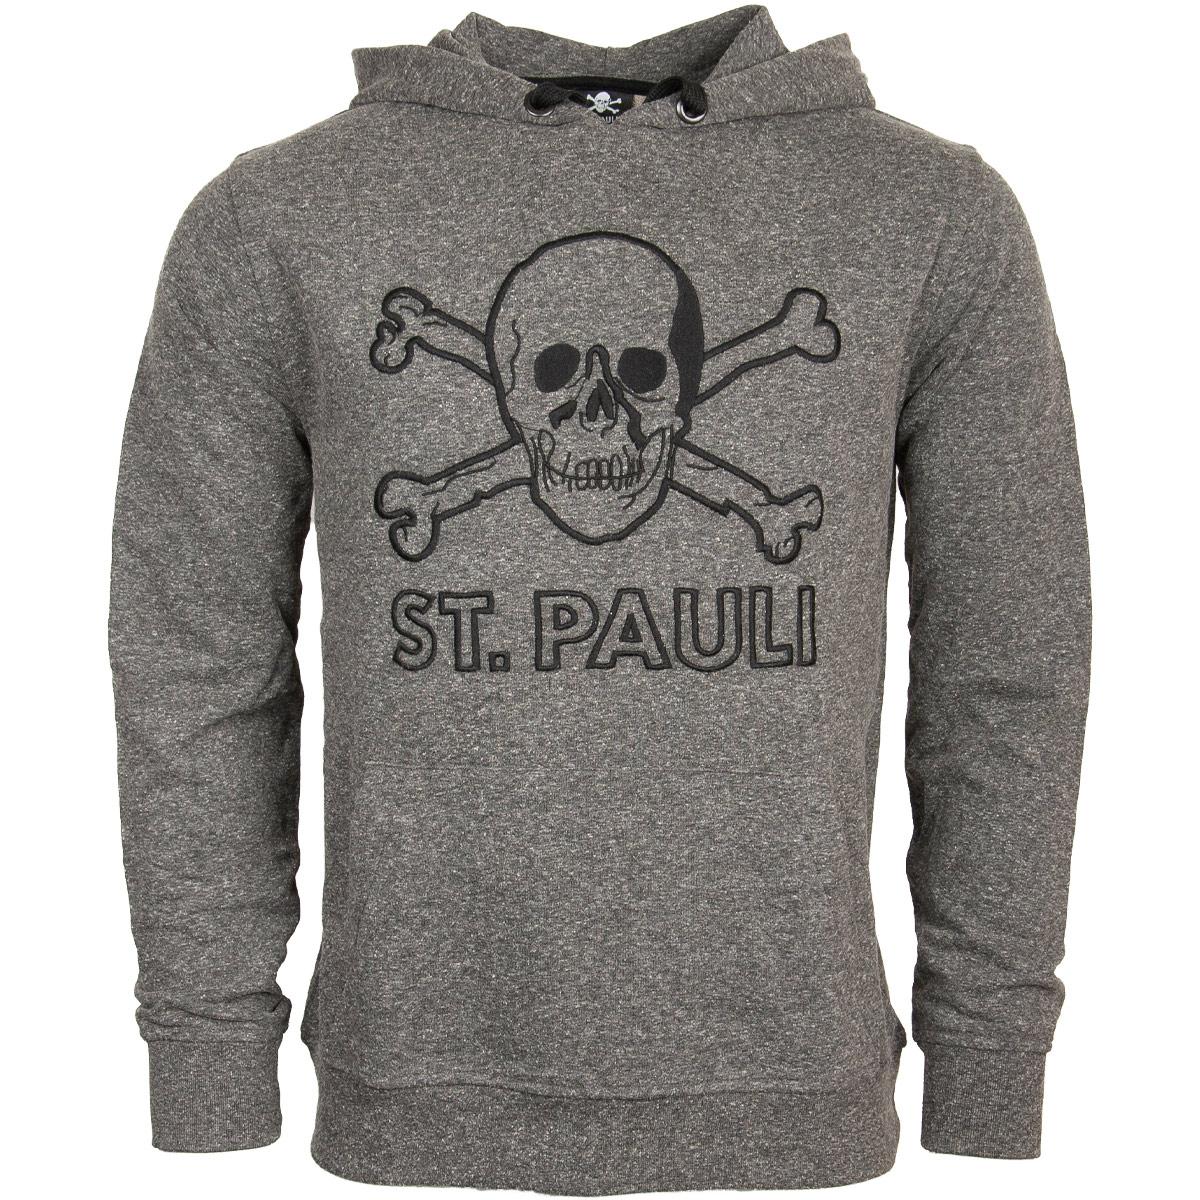 FC St. Pauli - Kapuzenpullover Terry Outline - grau